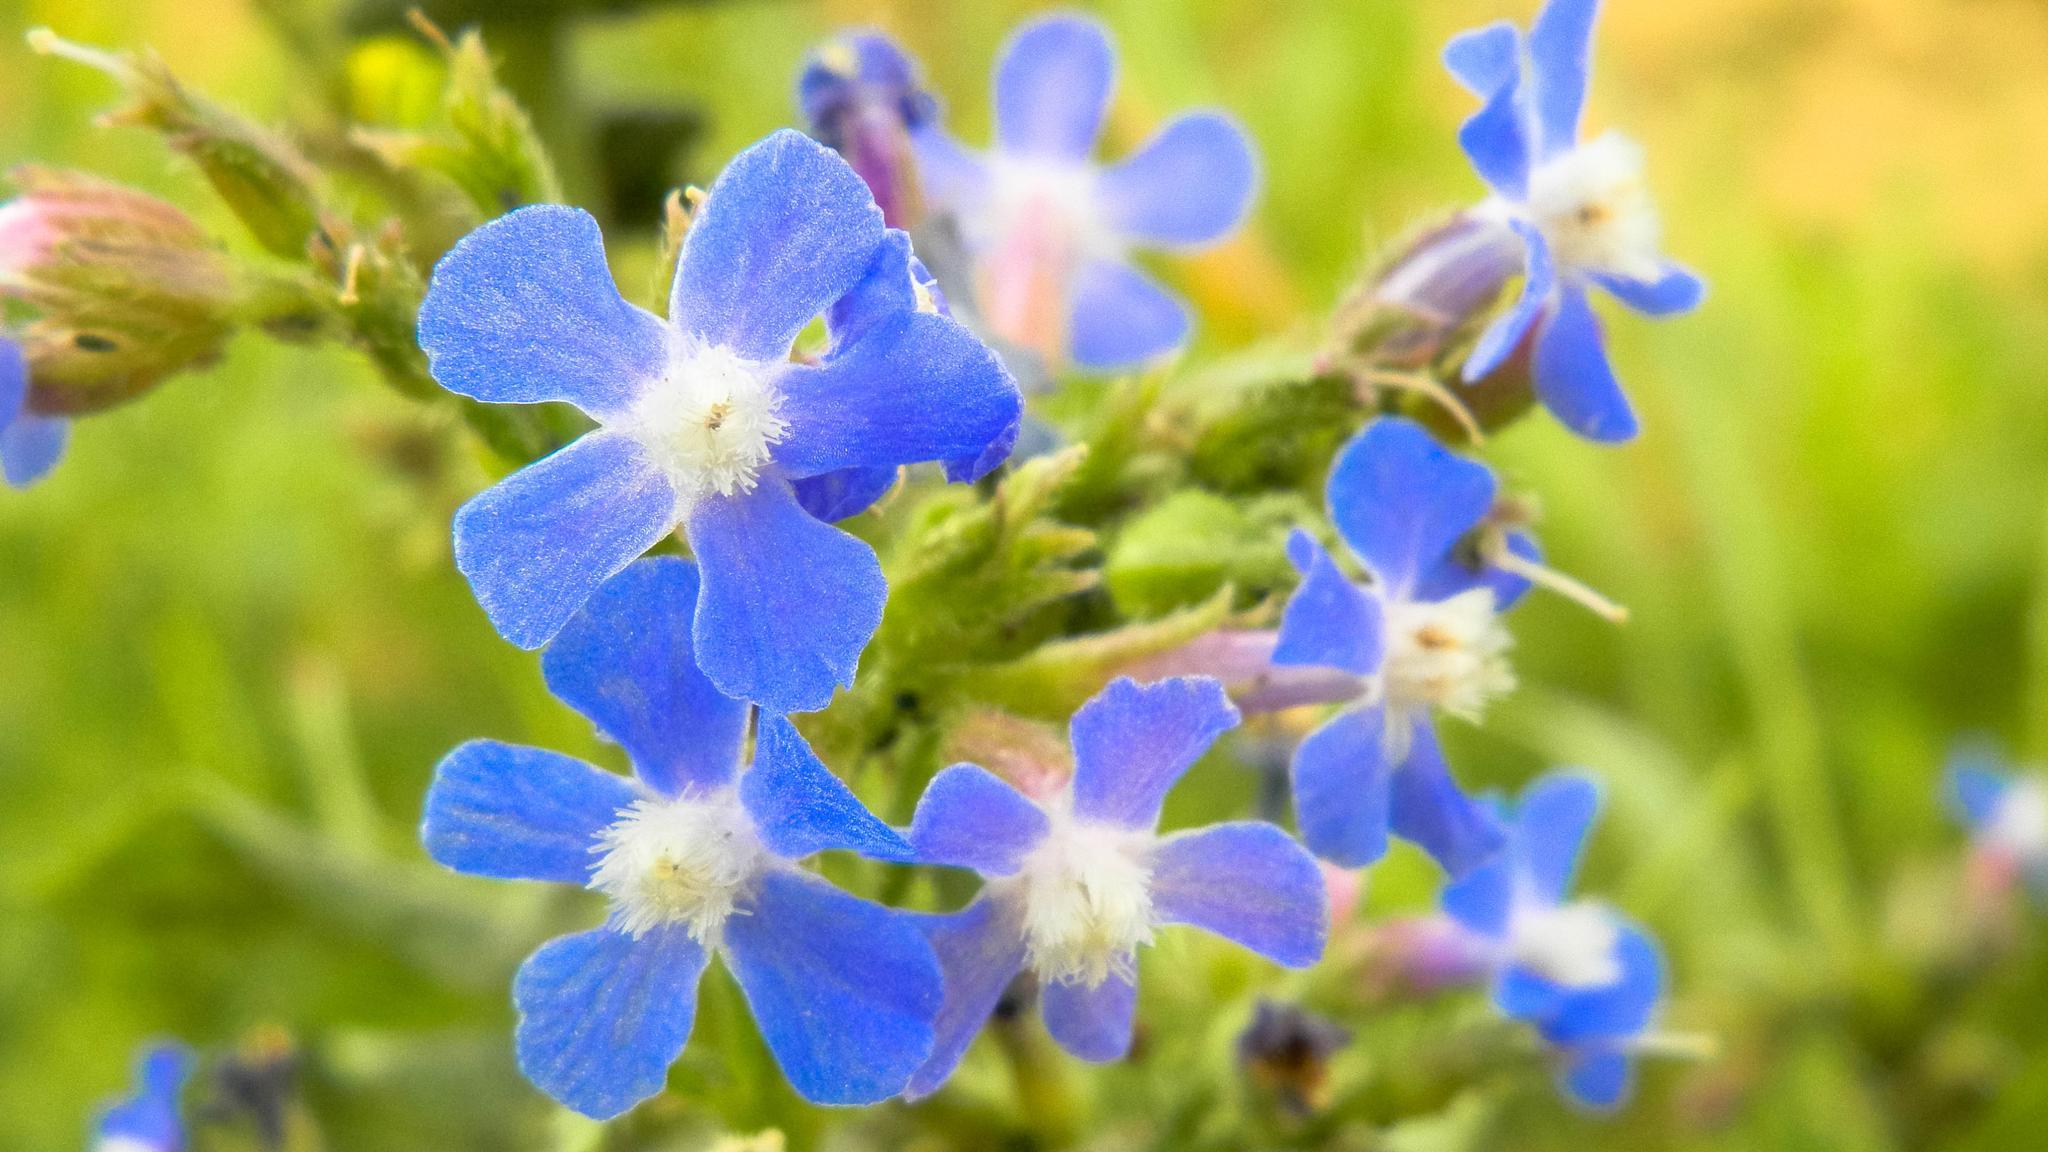 Blue Flower by Mirza N. Islam